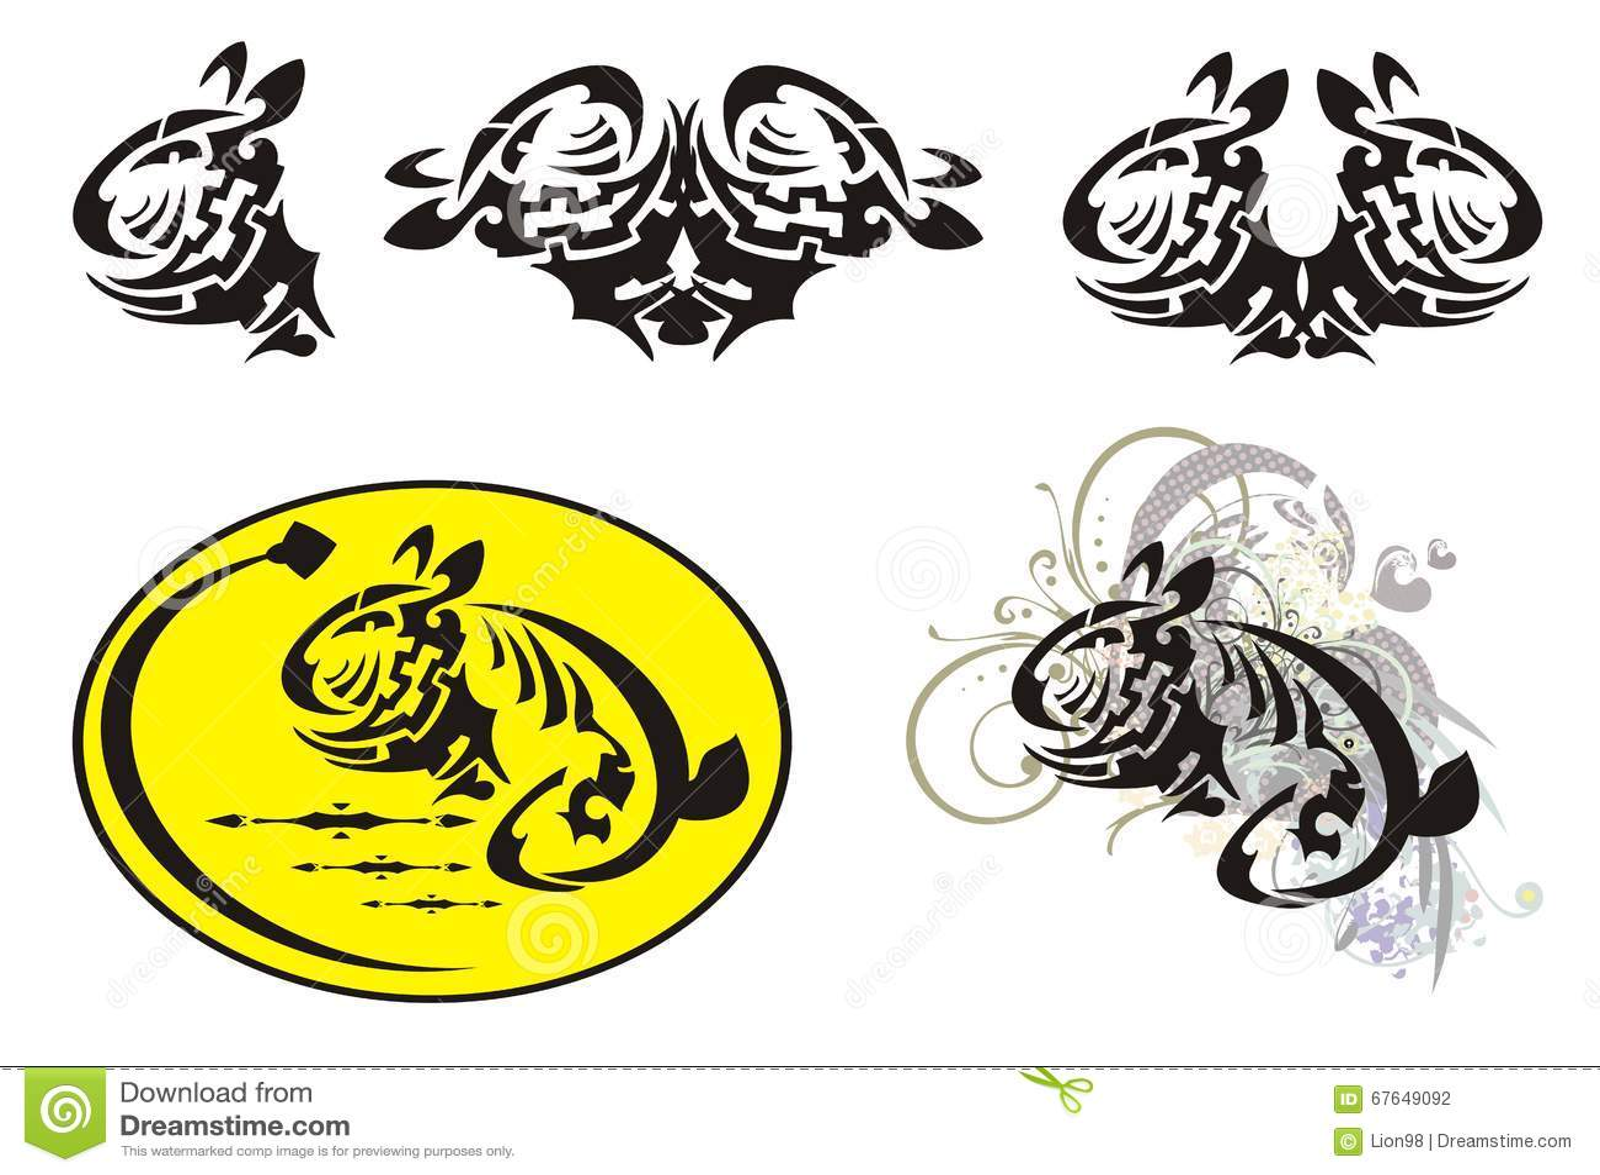 Rabbit and egg easter symbols in tribal style stock vector rabbit and egg easter symbols in tribal style buycottarizona